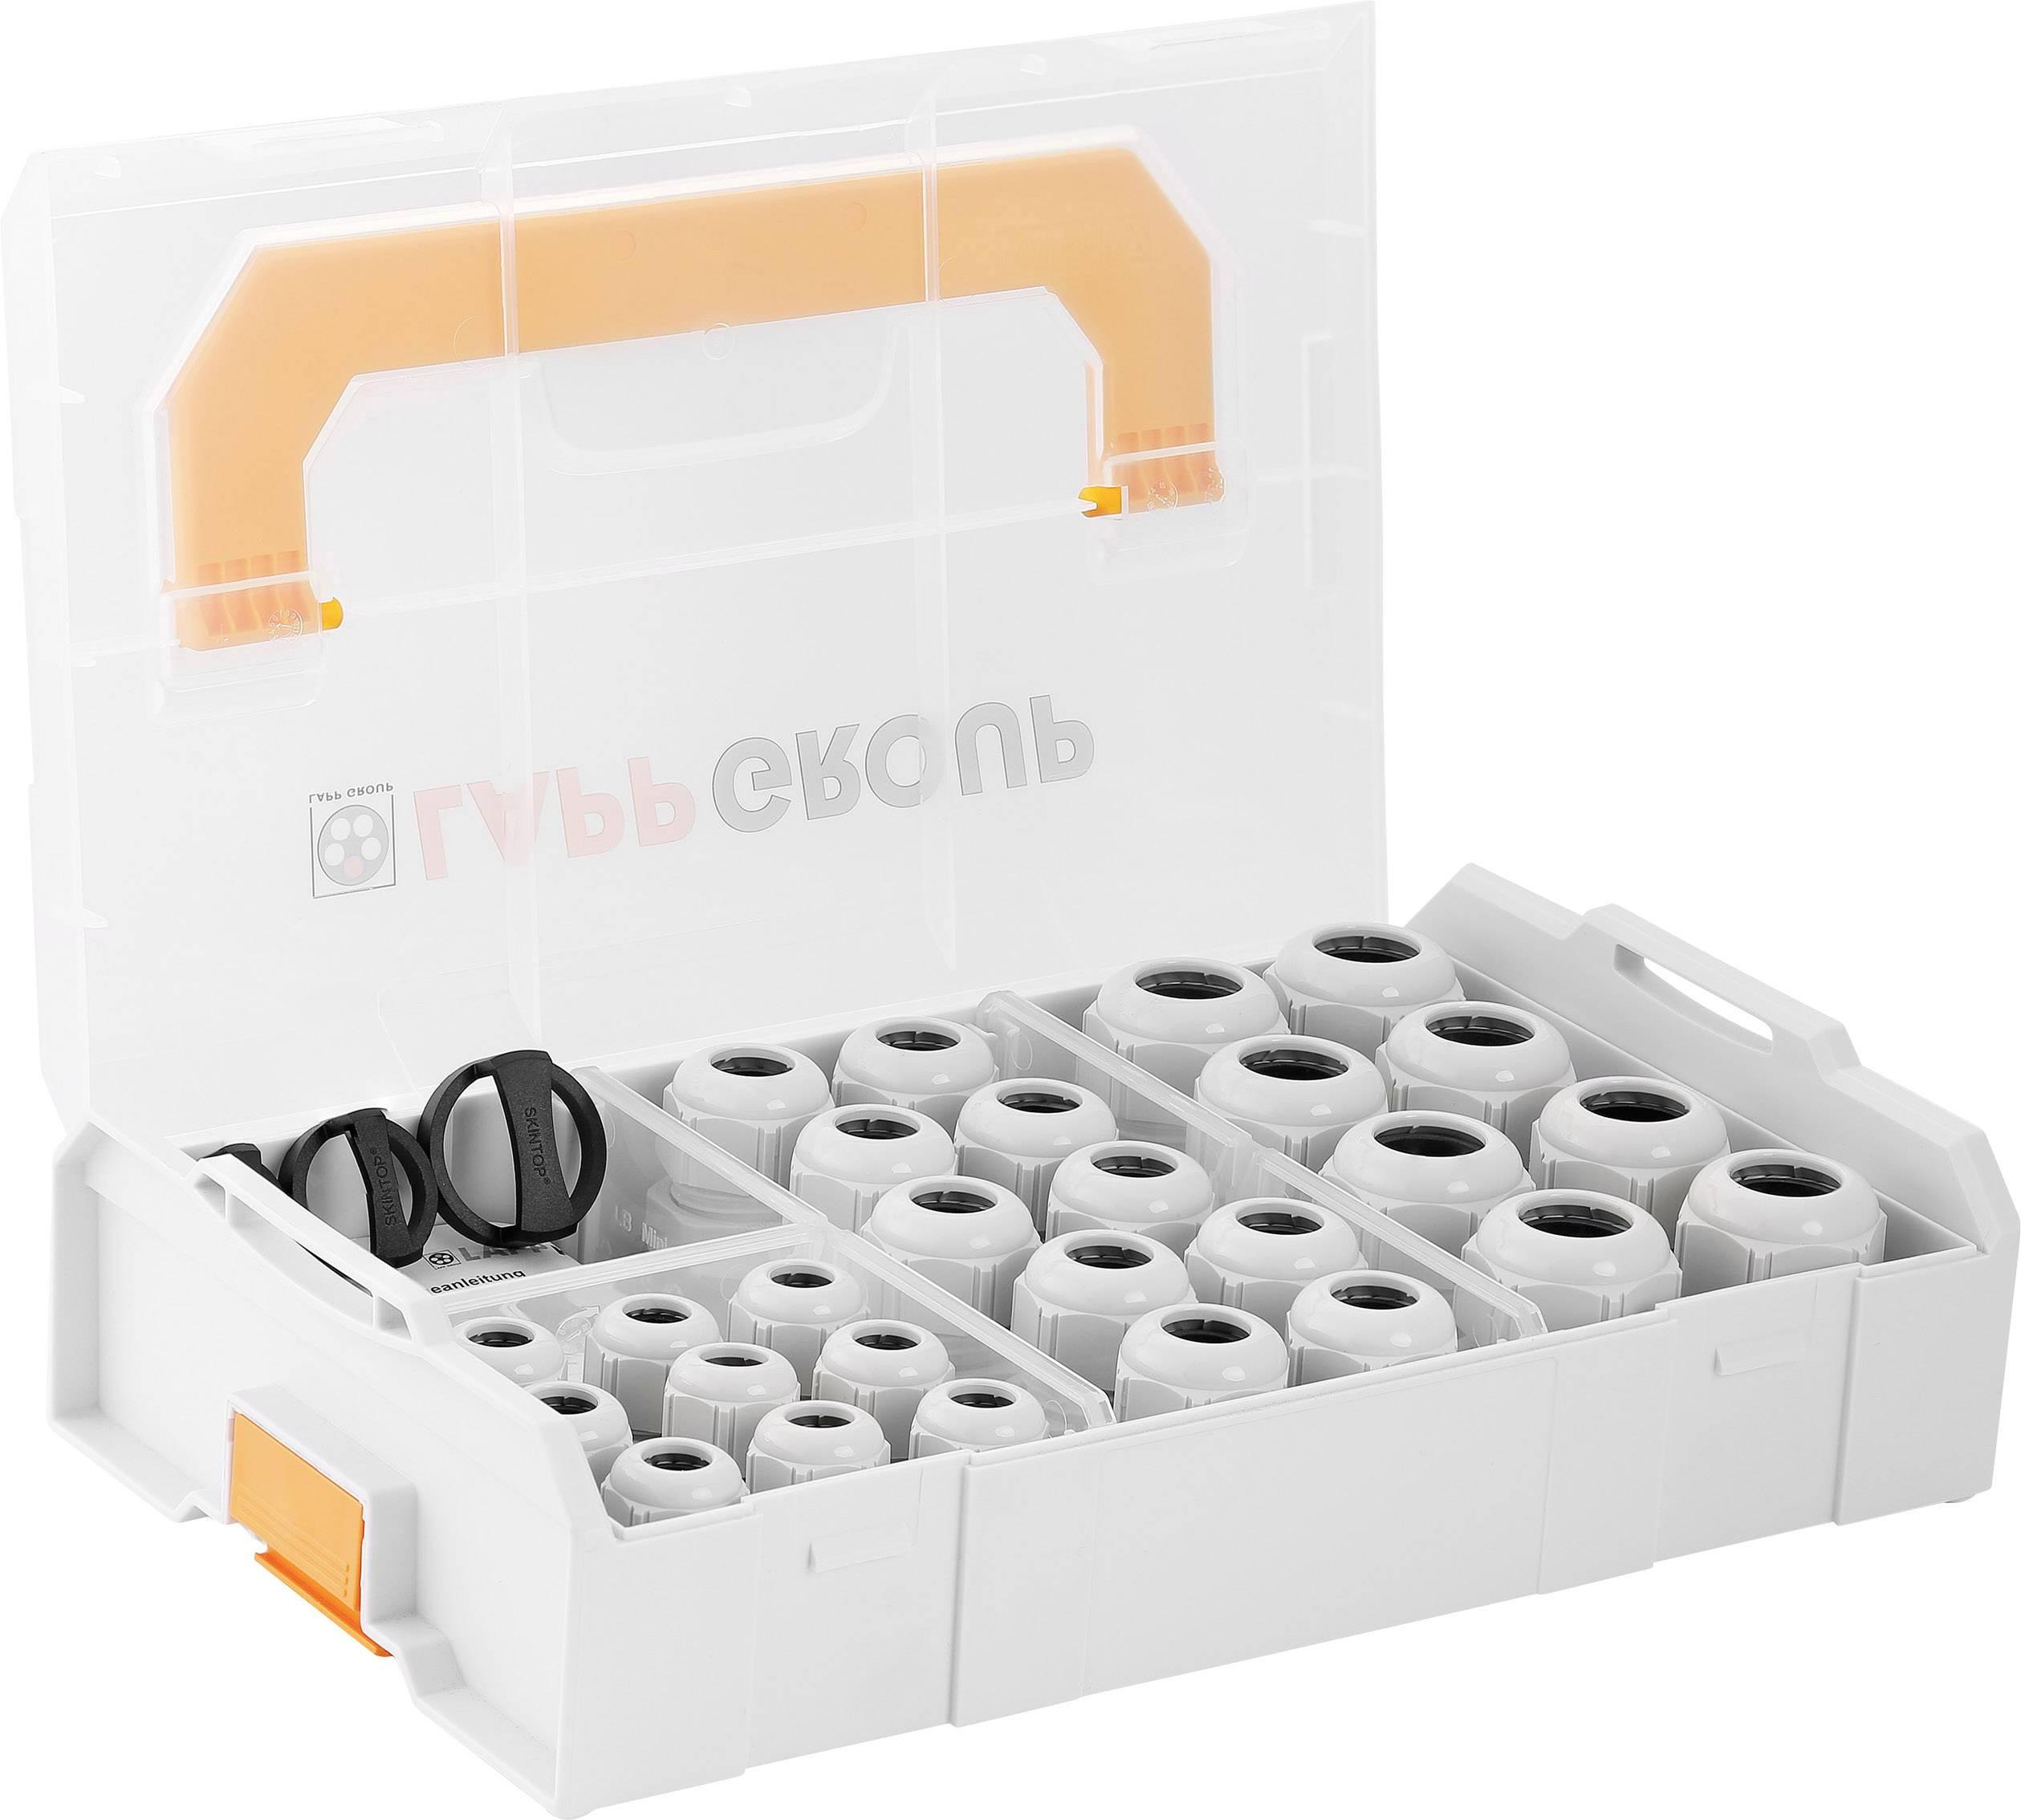 Súprava káblových priechodiek LappKabel SKINTOP® L-BOXX MINI CLICK, polyamid, striebrosivá (RAL 7001), 1 sada